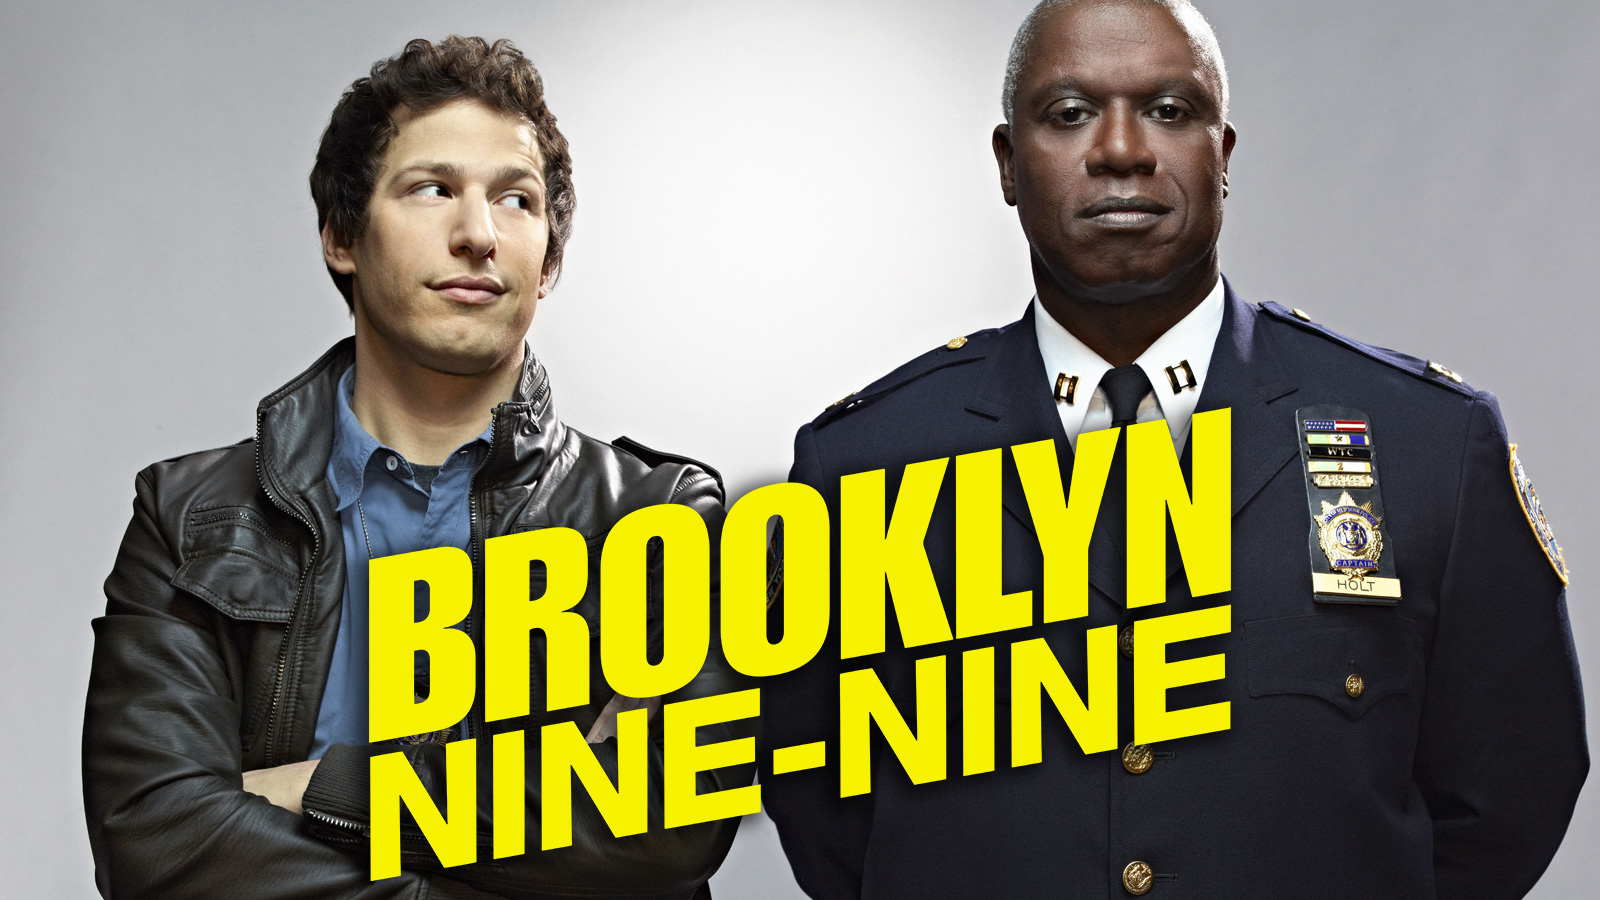 brooklyn nine nine s06e01 watchseries